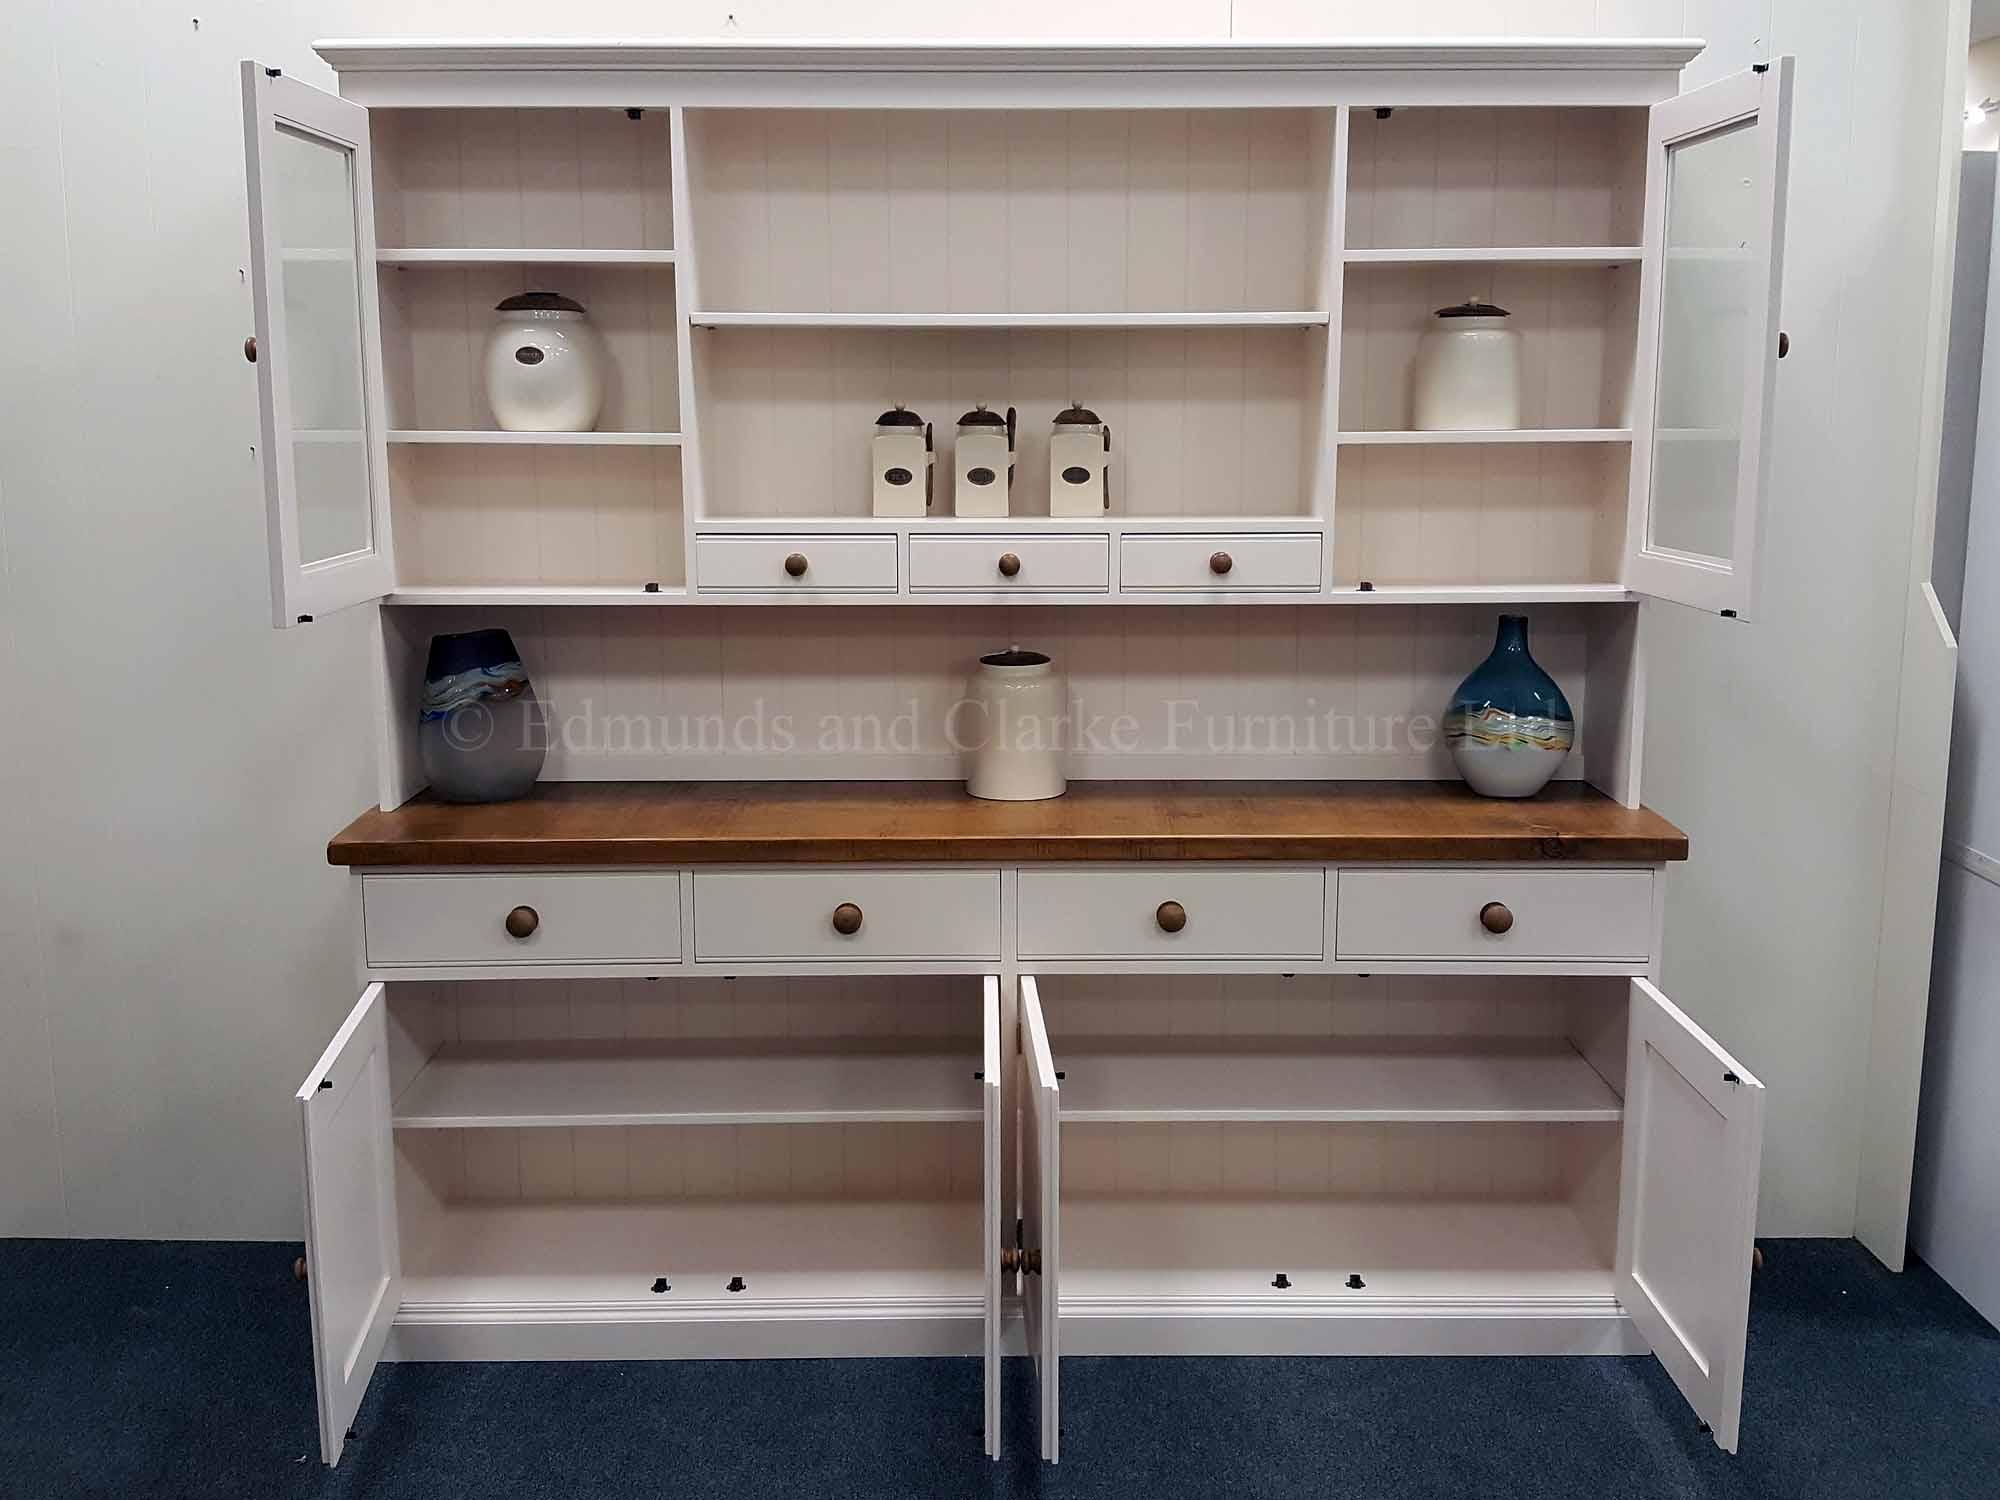 Edmunds plain painted kitchen dresser 7ft wide rough sawn chunky pine top